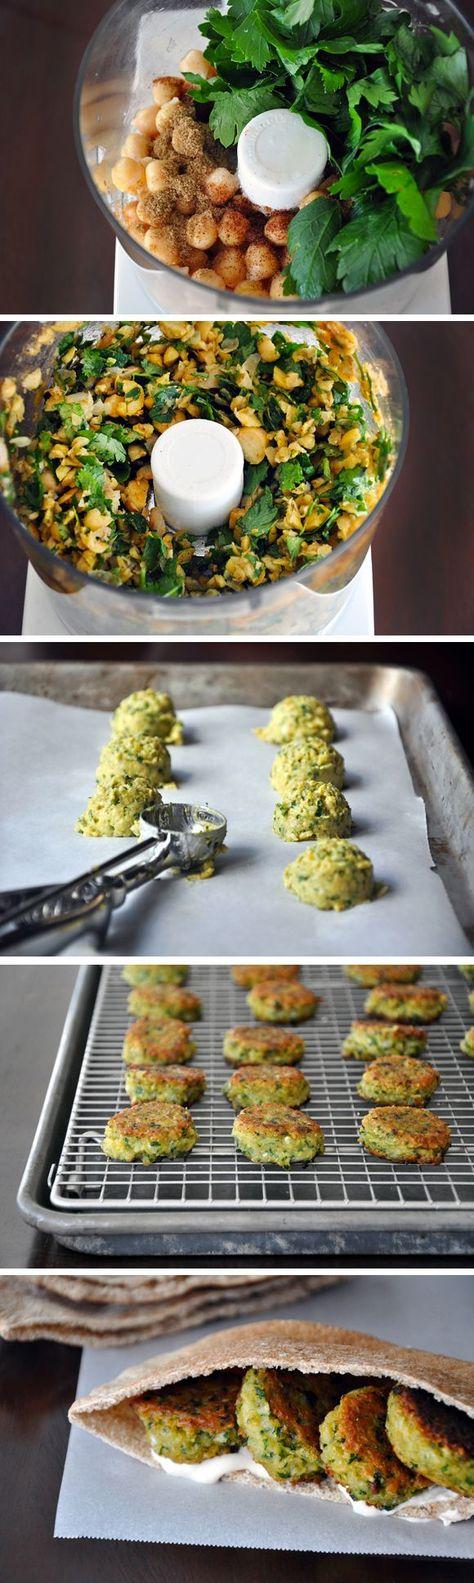 Homemade Falafel #Fitfluential #EAT